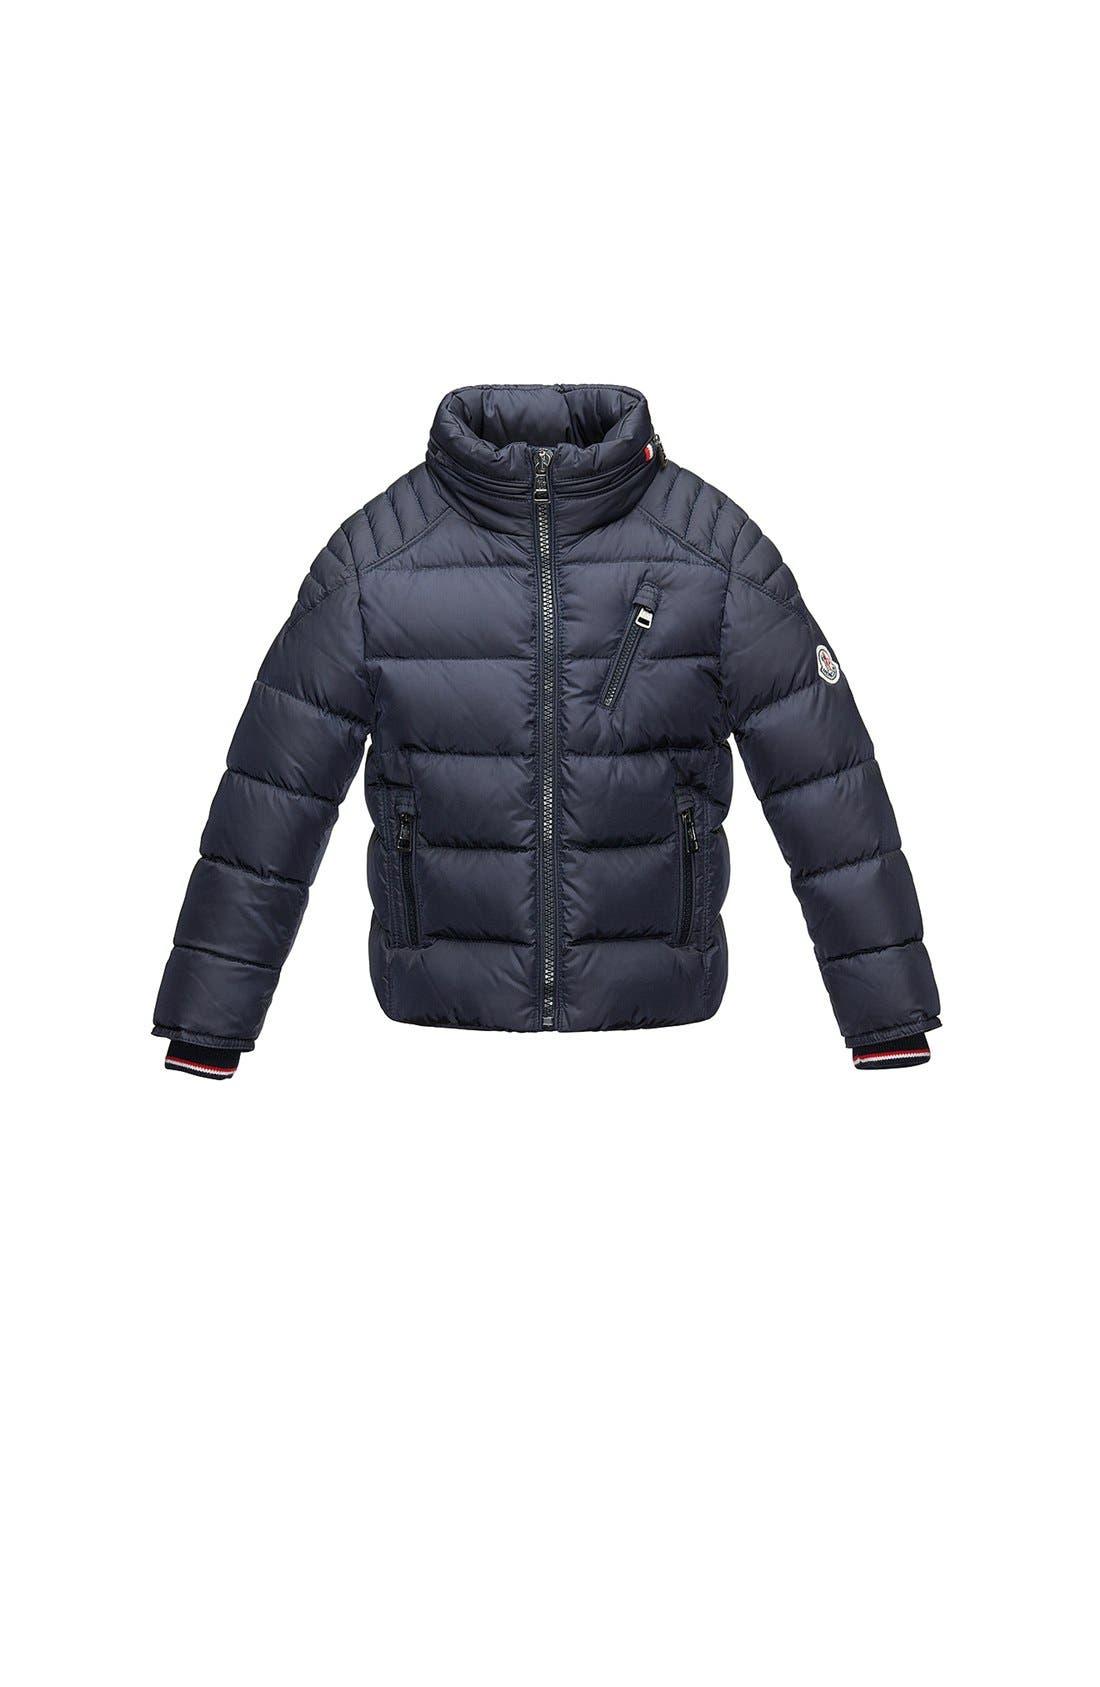 Main Image - Moncler 'Sebastien' Coat (Toddler Boys, Little Boys & Big Boys)